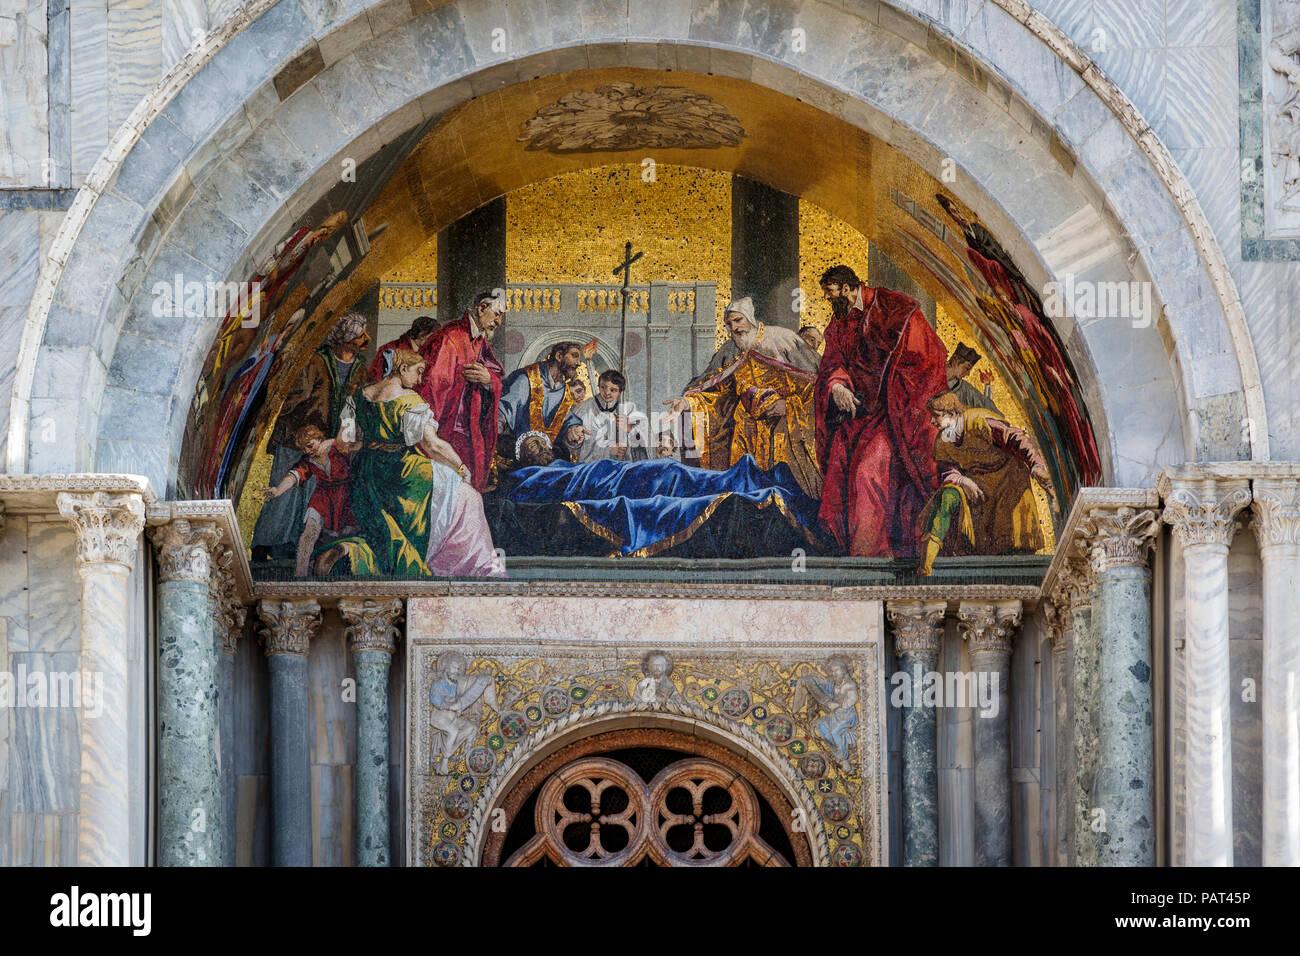 Mosaic over entry doors to Basilica di San Marco, Piazza San Marco, Venice, Veneto, Italy - Stock Image